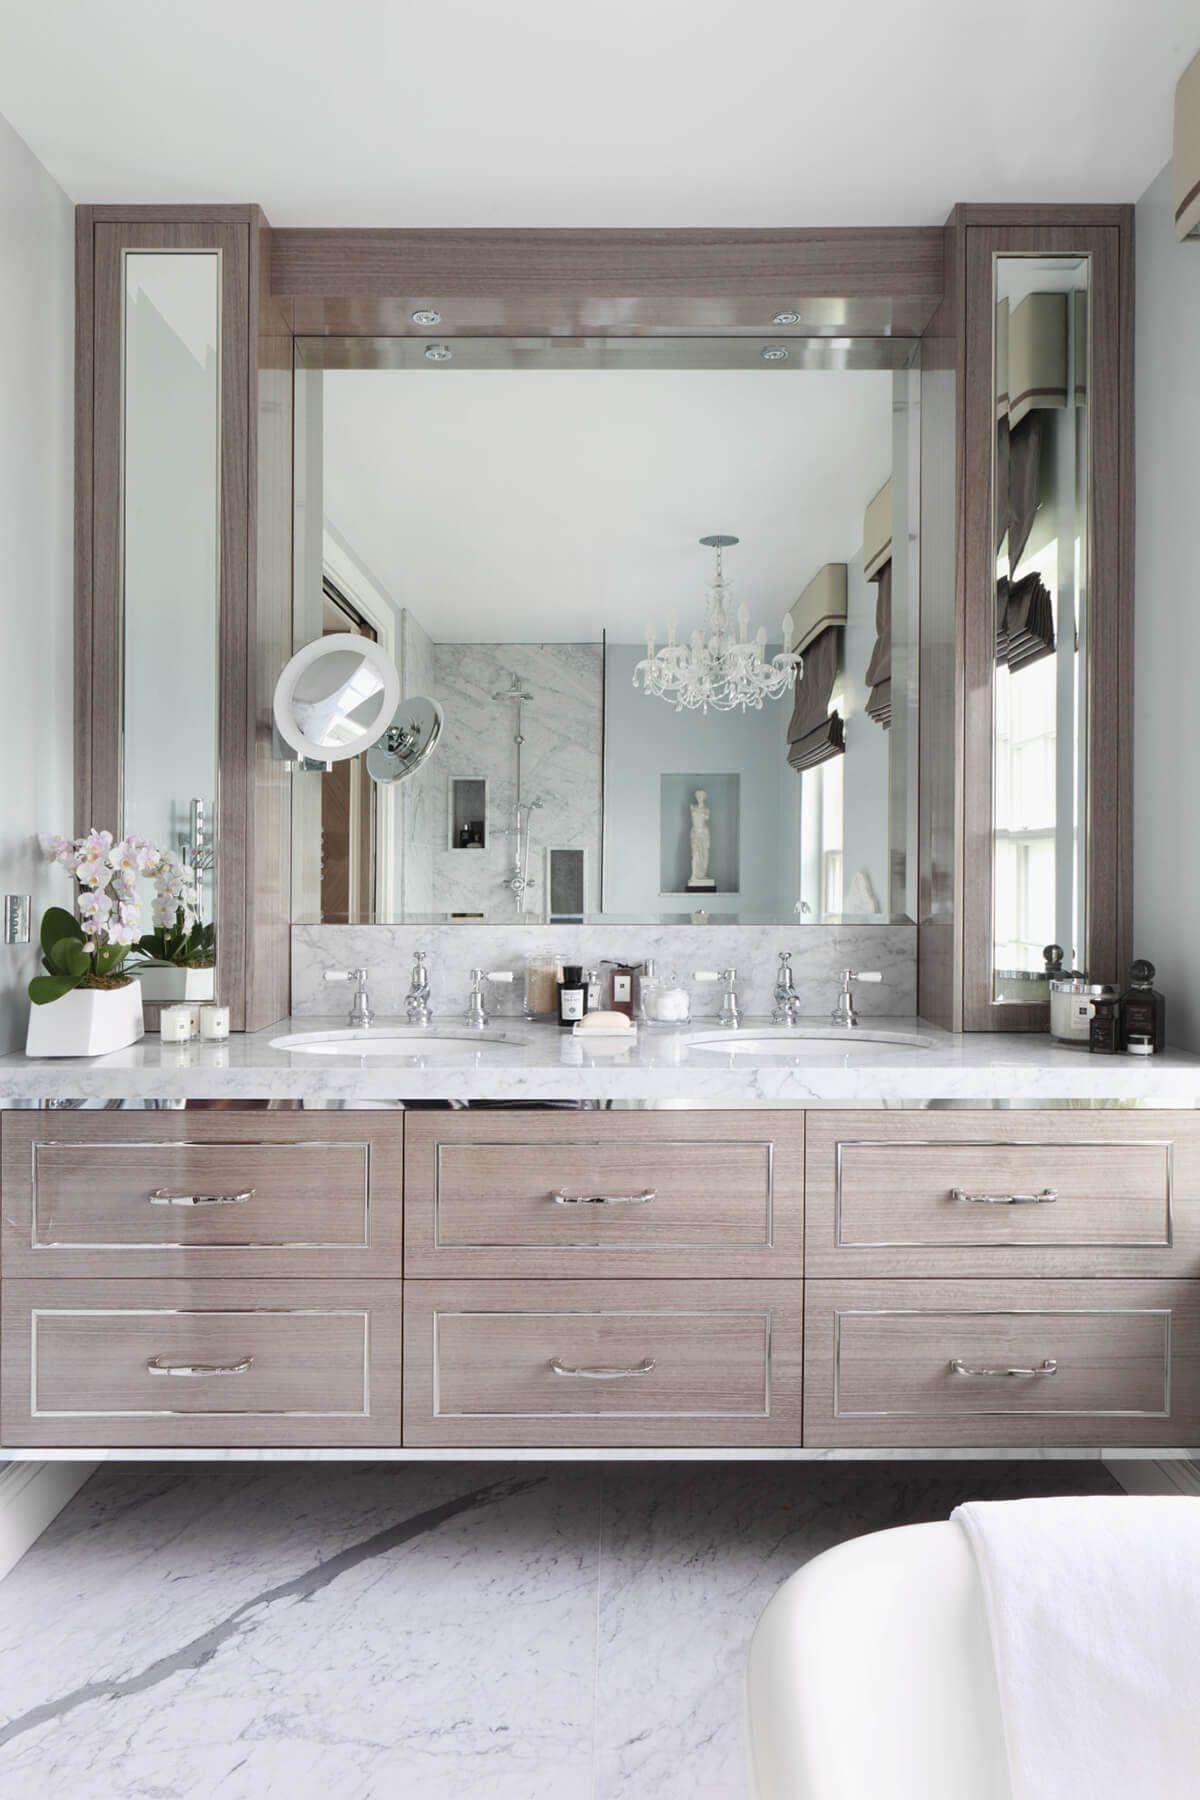 32 Rustic To Ultra Modern Master Bathroom Ideas To Inspire Your Next Renovation Luks Banyolar Guzel Banyolar Ic Mekan Fikirleri